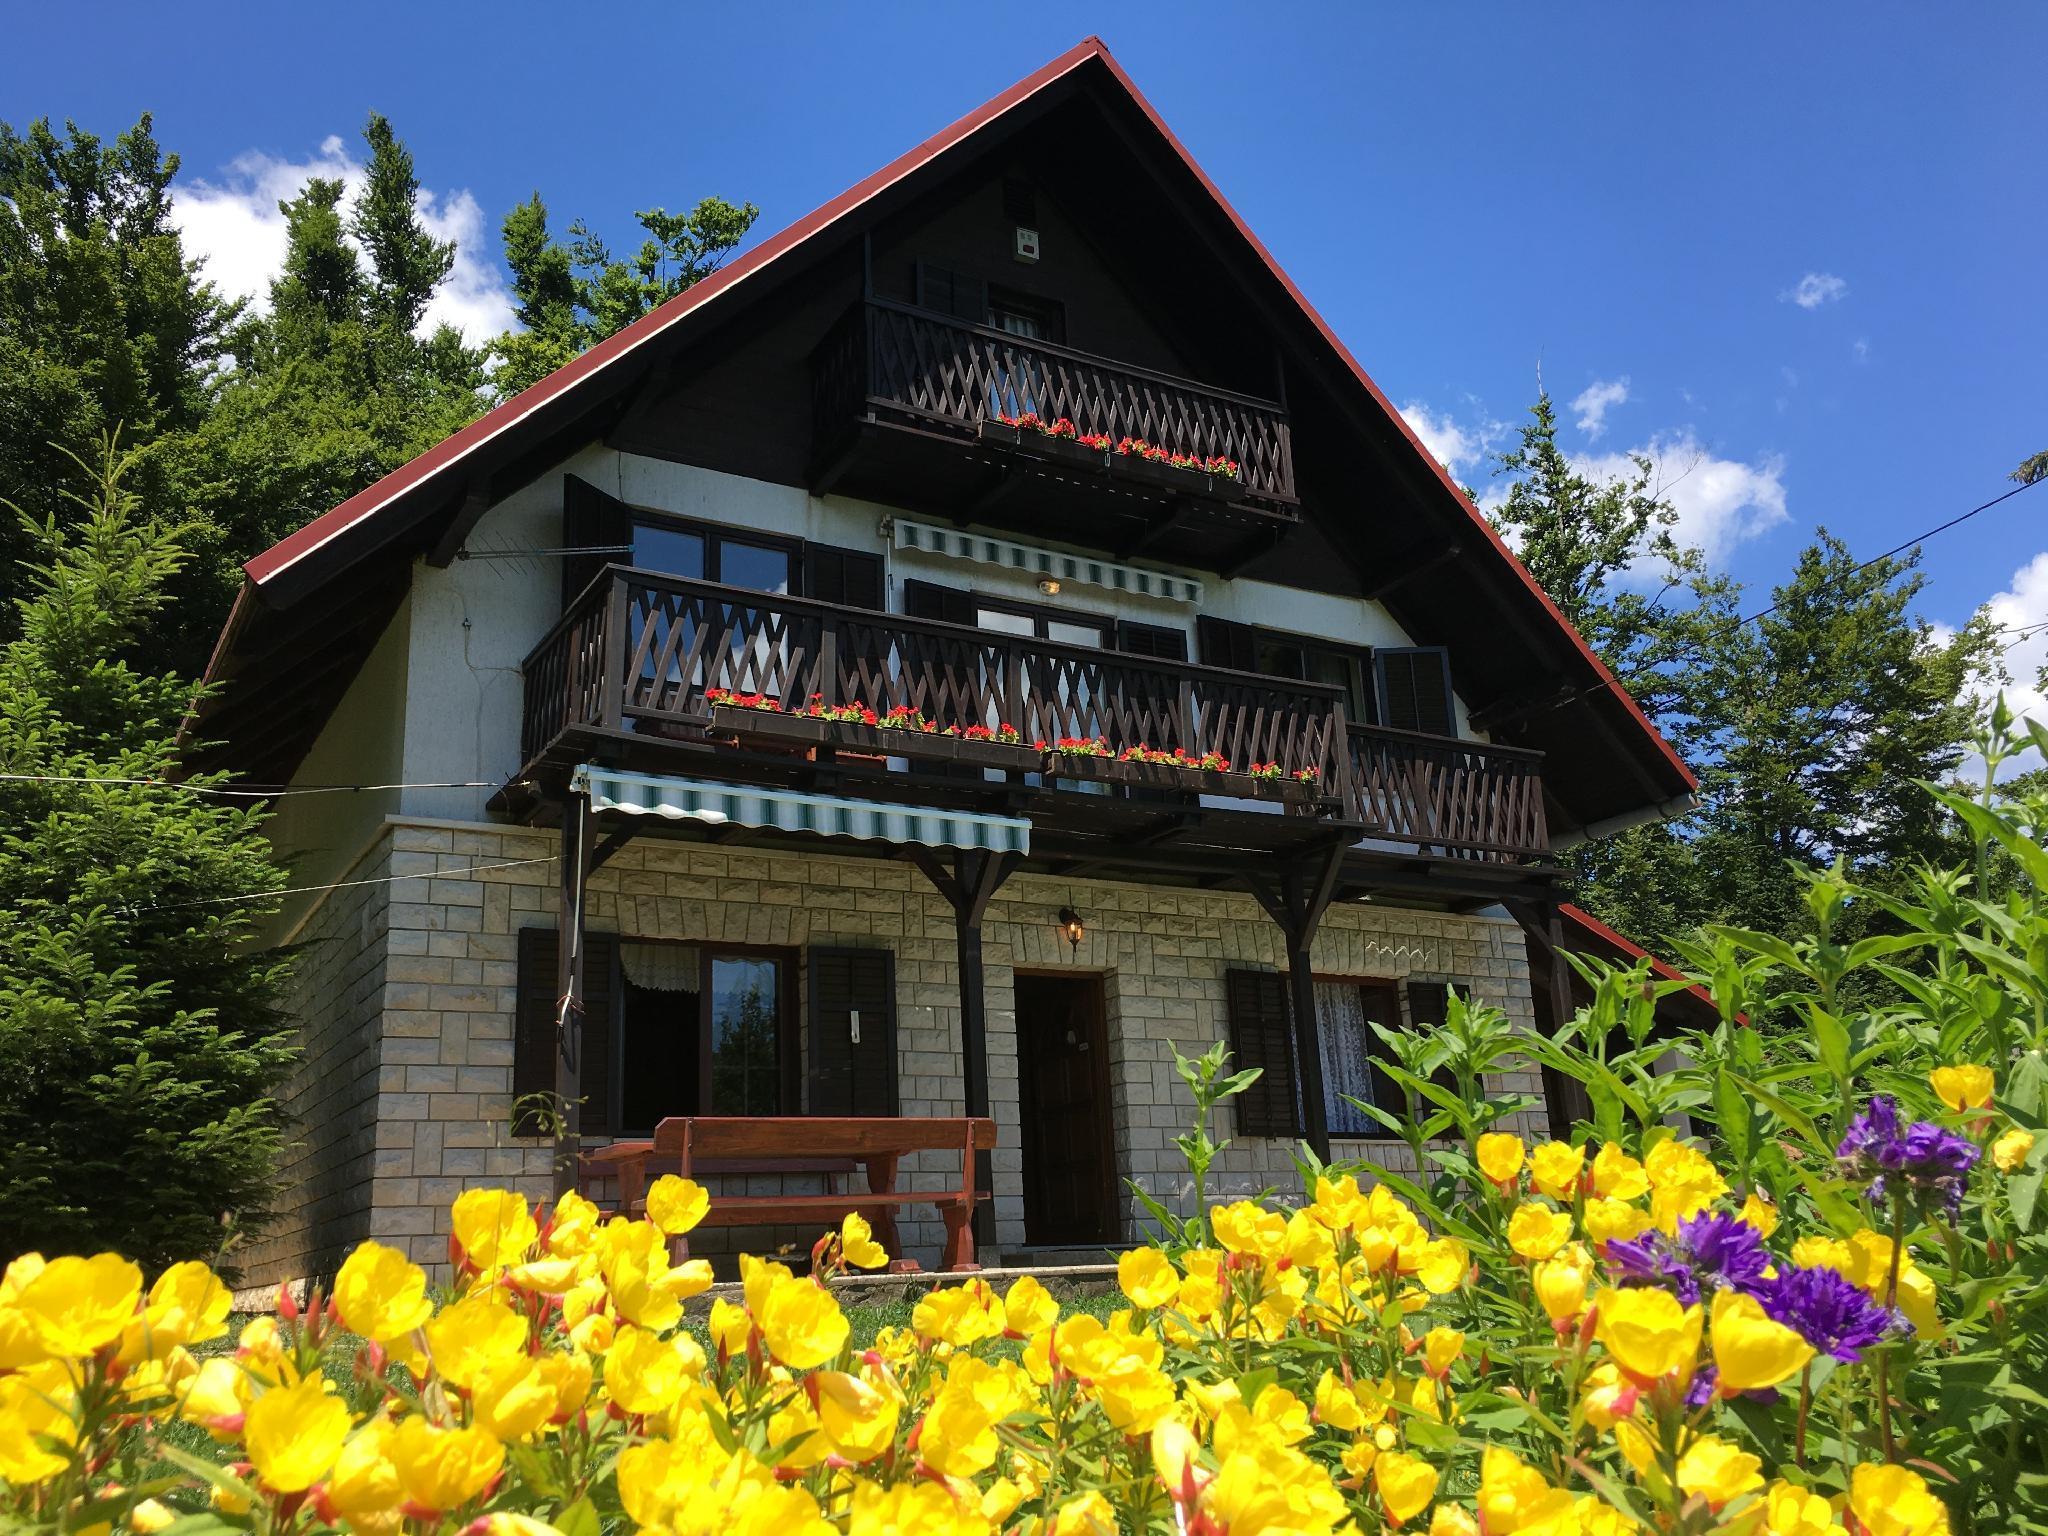 The Mountain Paradise Holiday House